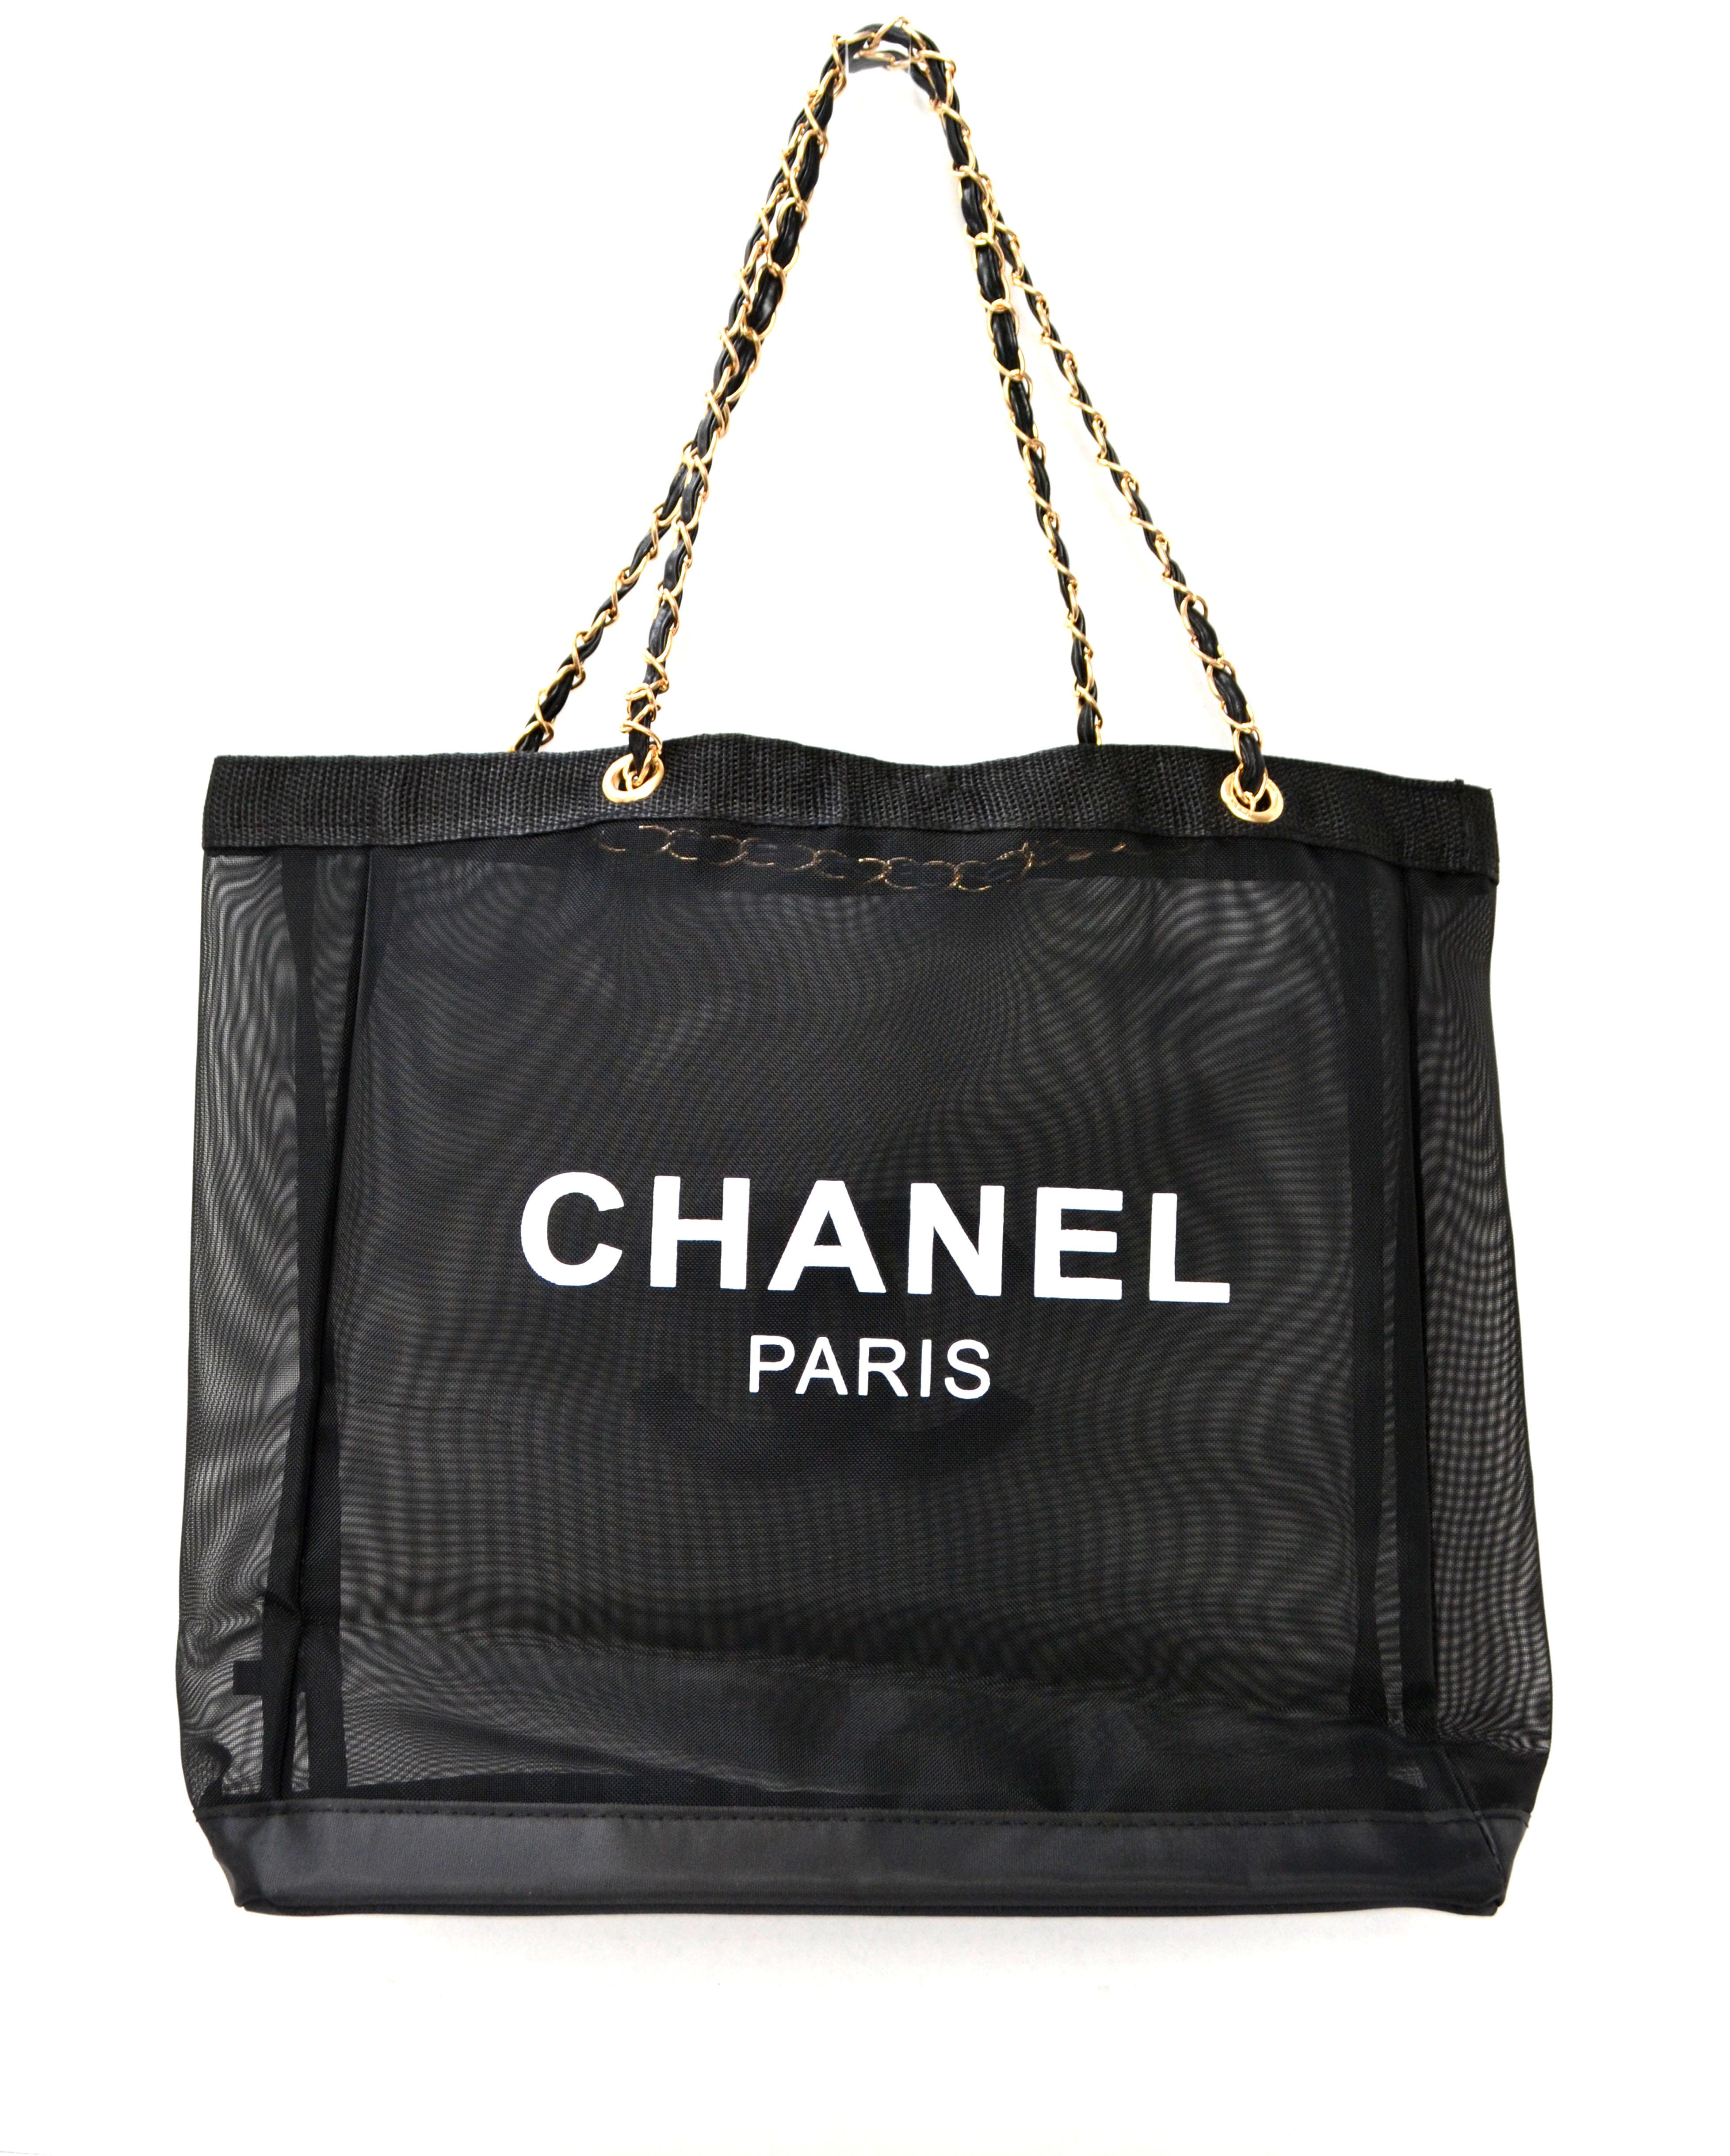 86457cf540f3 Chanel New Chanel Mesh Tote Shopper Beach Bag Gold Tone Chain Vip ...